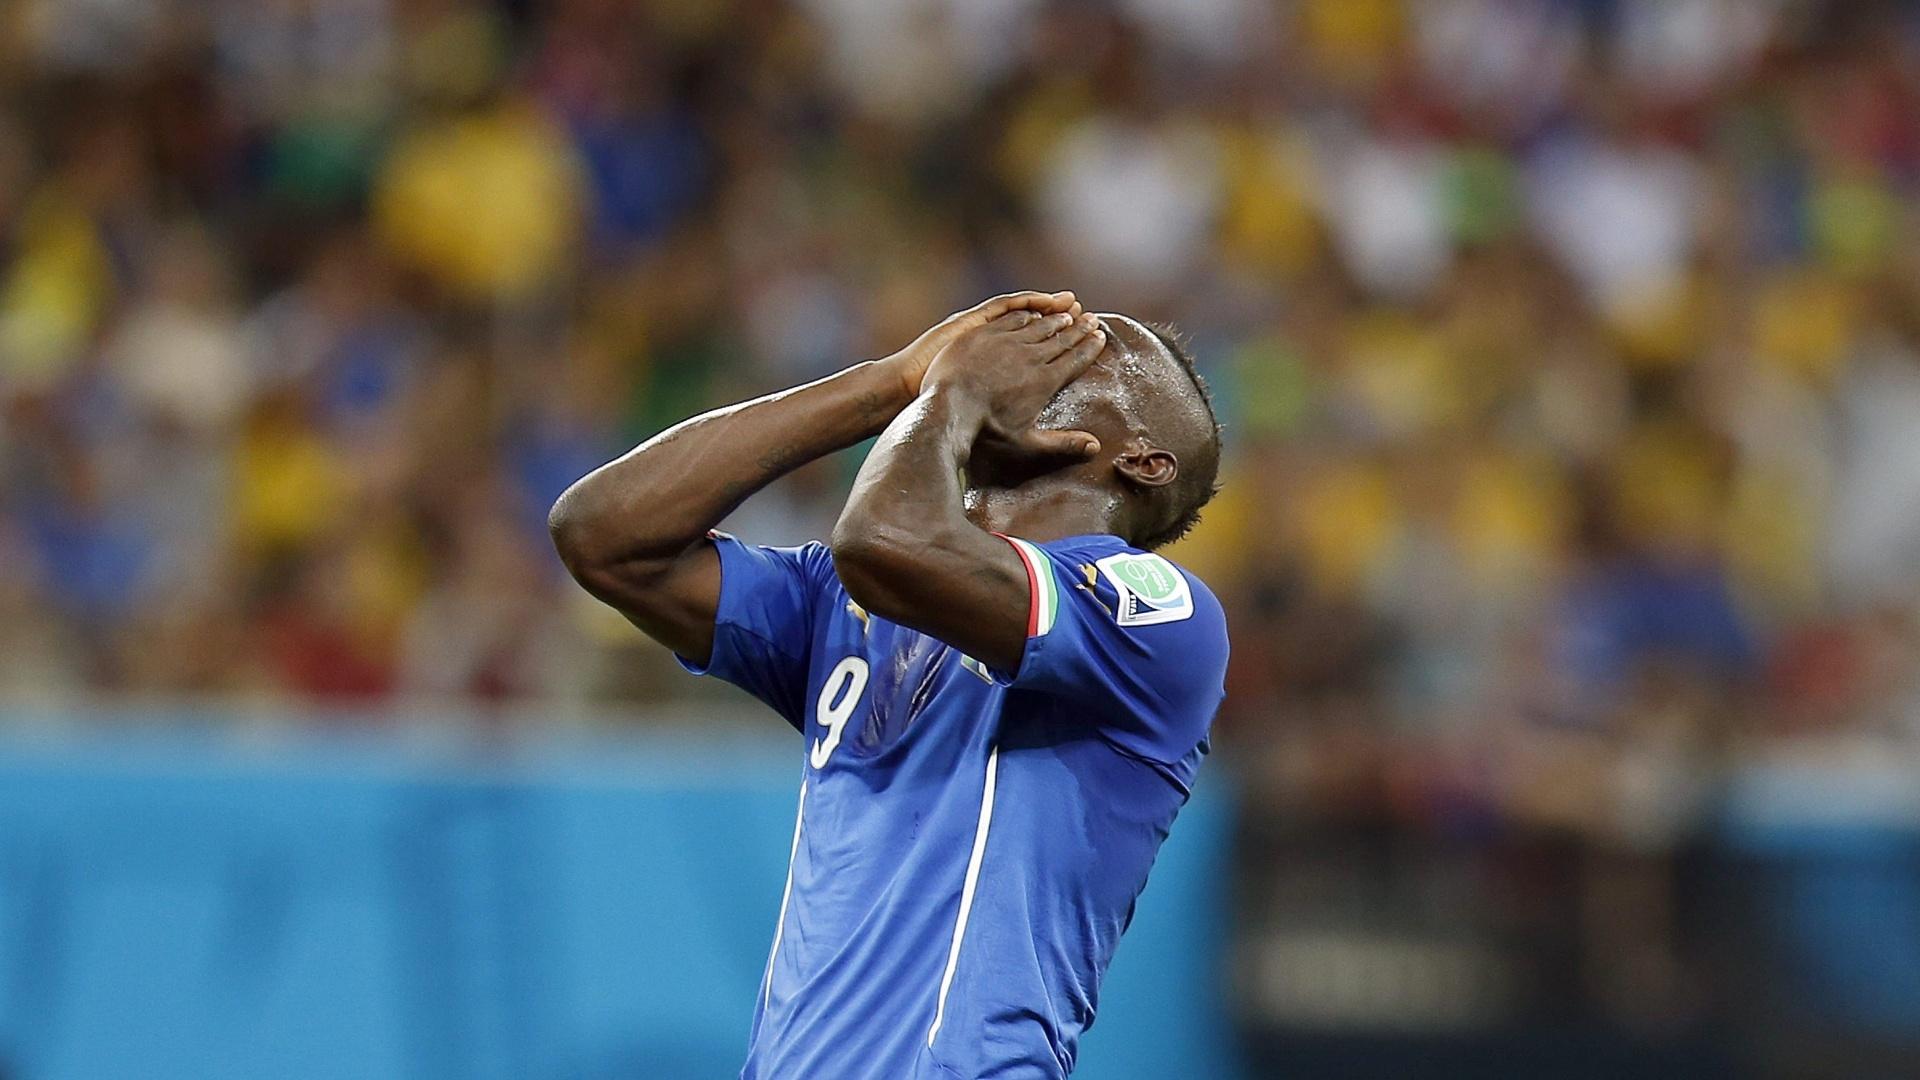 Balotelli lamenta oportunidade desperdiçada na partida da Itália contra a Inglaterra, na Arena Amazônia